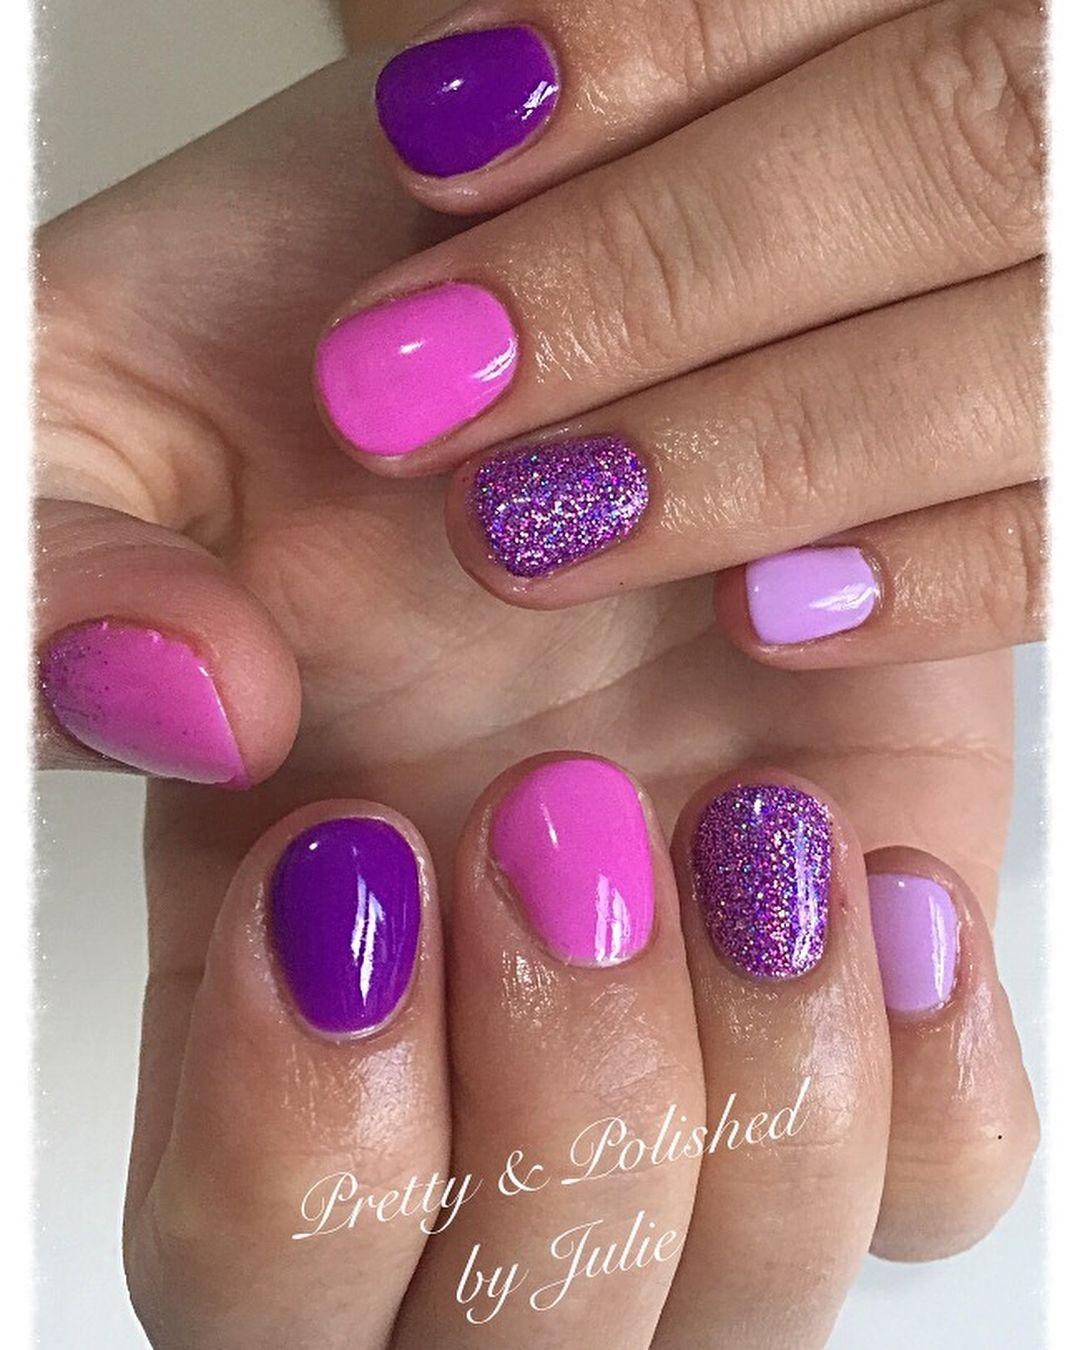 Gelnails Naturalnails Instanails Glitternails Nailsofinstagram Purple Pink Love Summercolo Purple Gel Nails Purple And Pink Nails Purple Glitter Nails